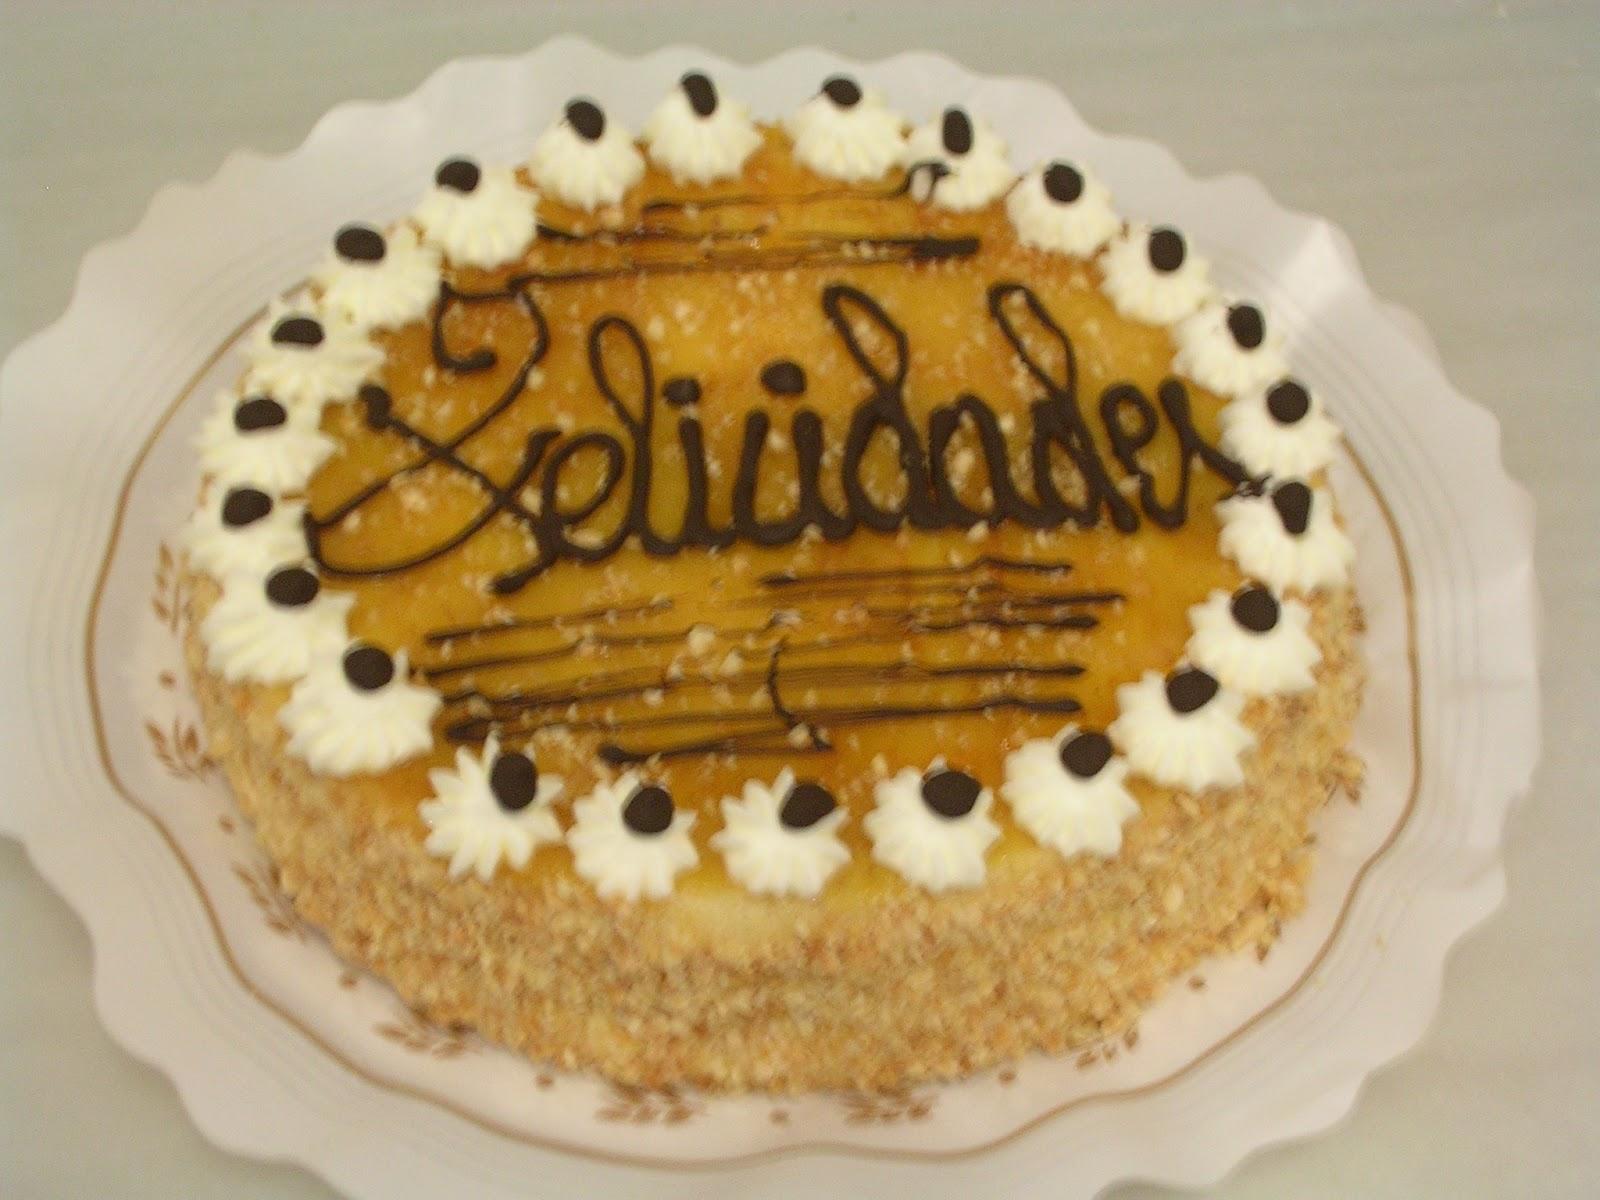 #CUMPLEAÑOS FELIZ#CUMPLEAÑOS FELIZ# TE DESEAMOS A TI# - Página 6 Tarta+cumplea%C3%B1os-panaderia+Buera